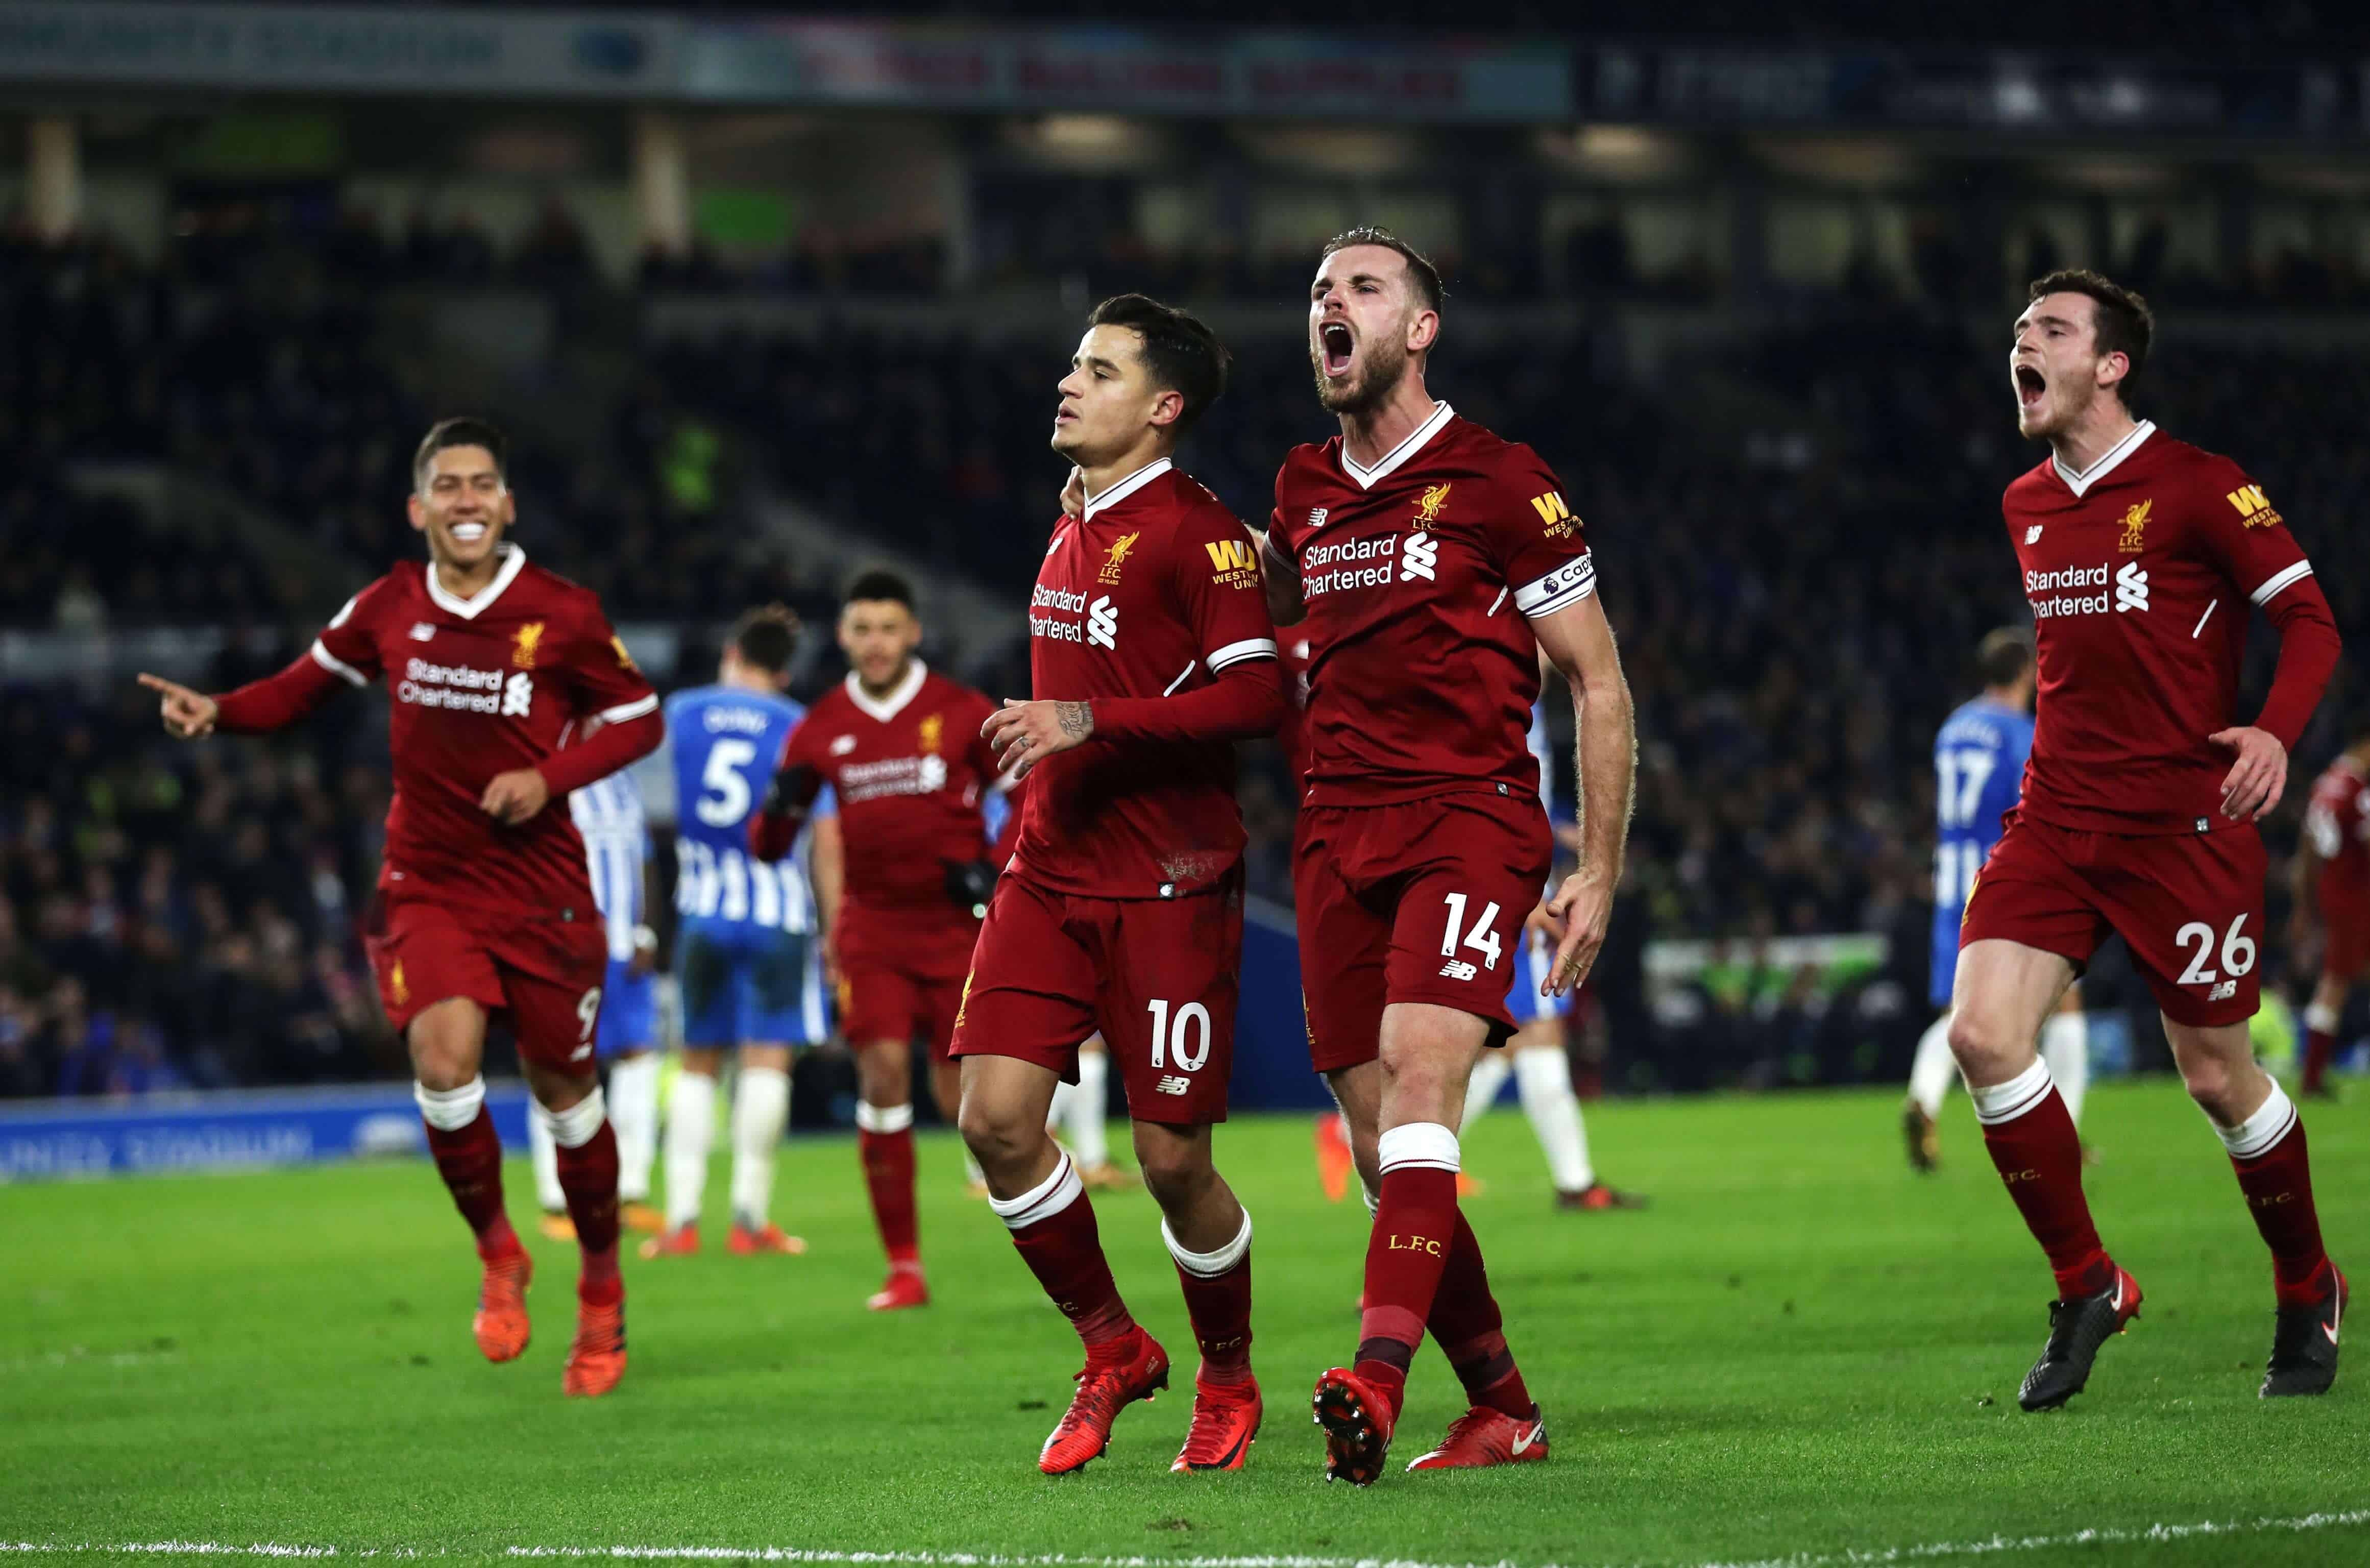 Prediksi Liverpool vs Tottenham Hotspur 31 Maret 2019